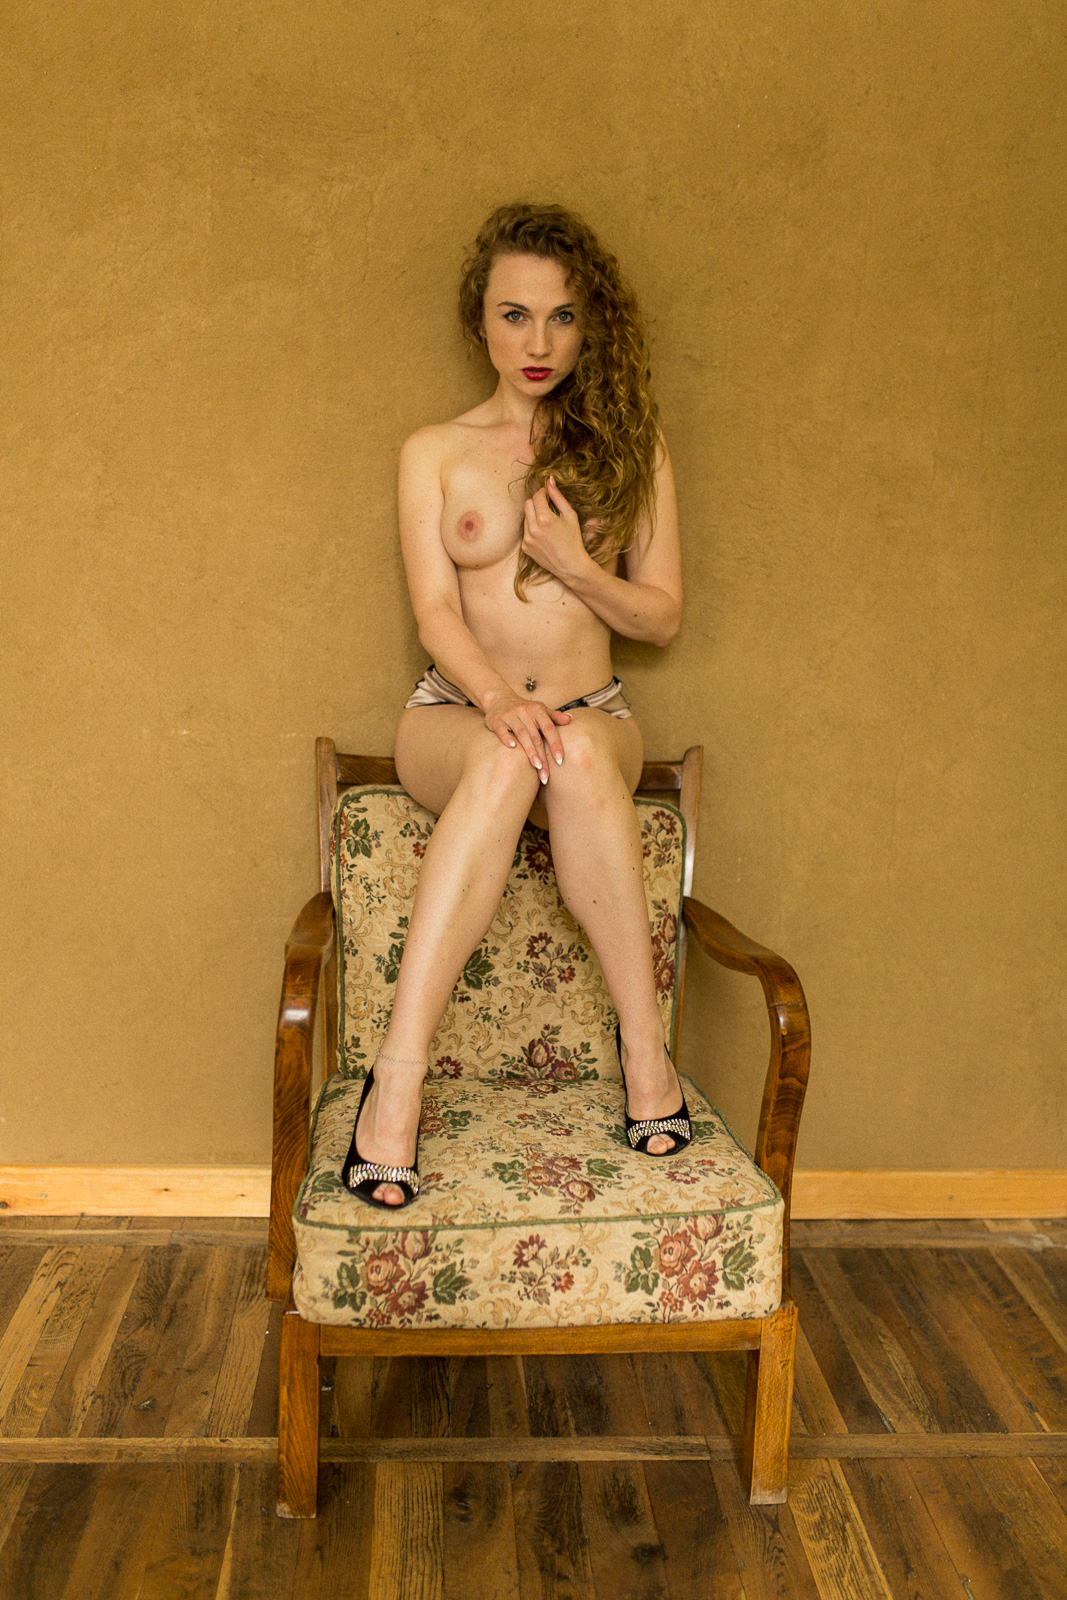 Christin im Sessel - Akt Erotik Boudoir Fotograf sexy Homeshooting nackt